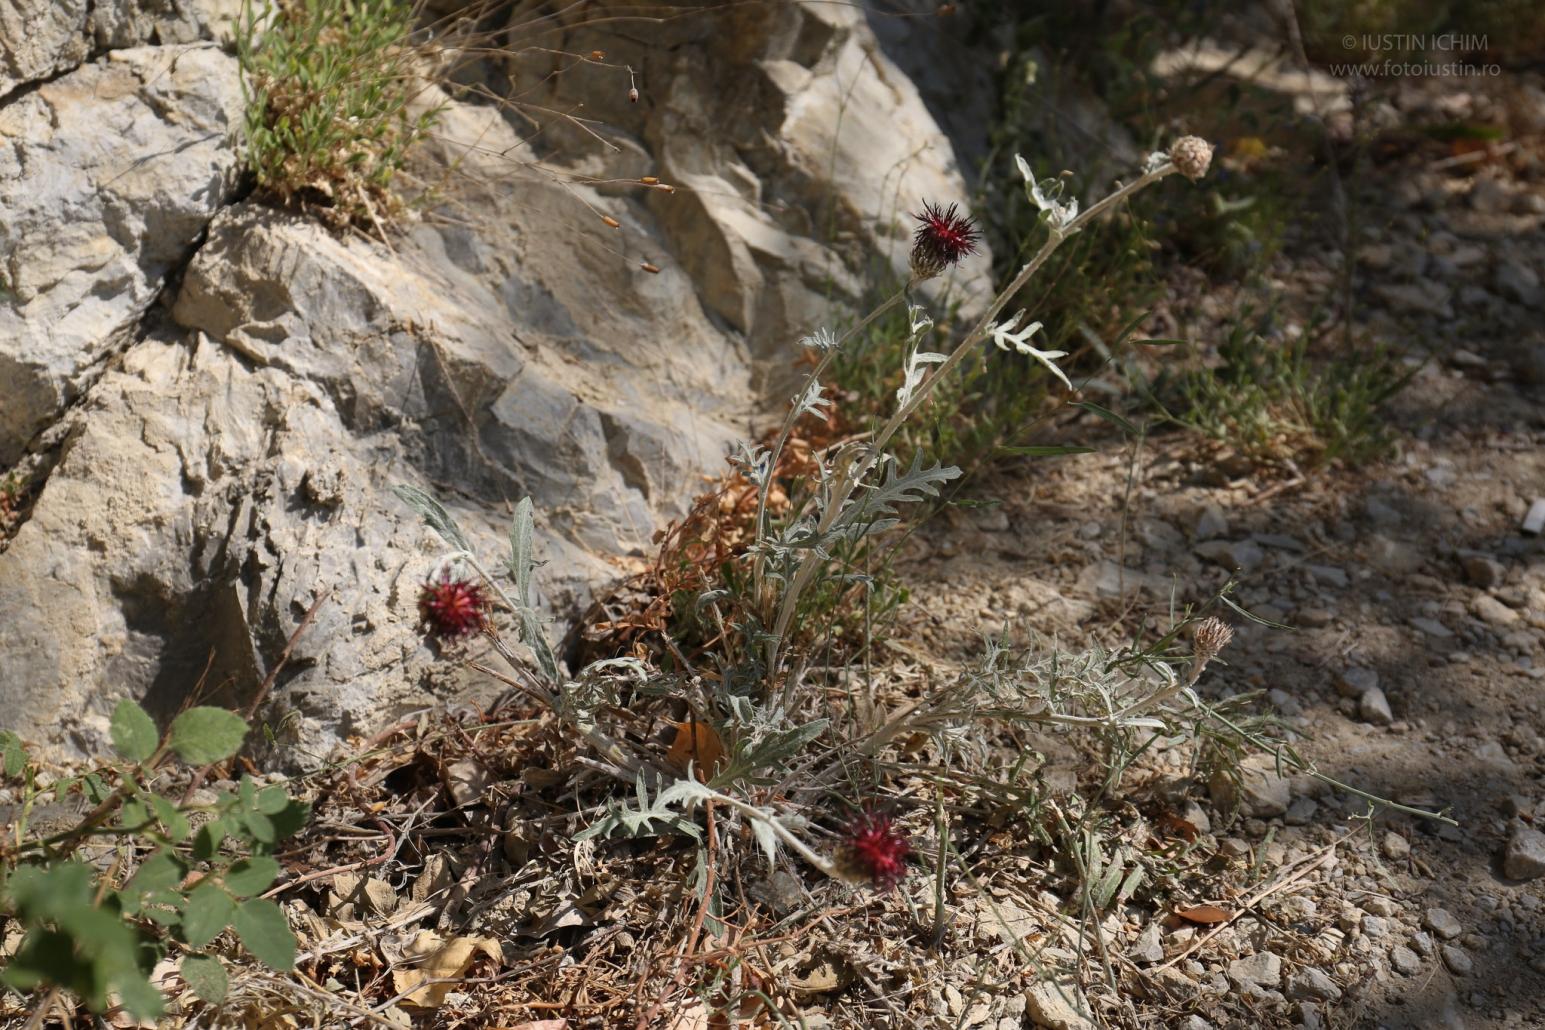 Centaurea calocephala, in Cheile Nerei